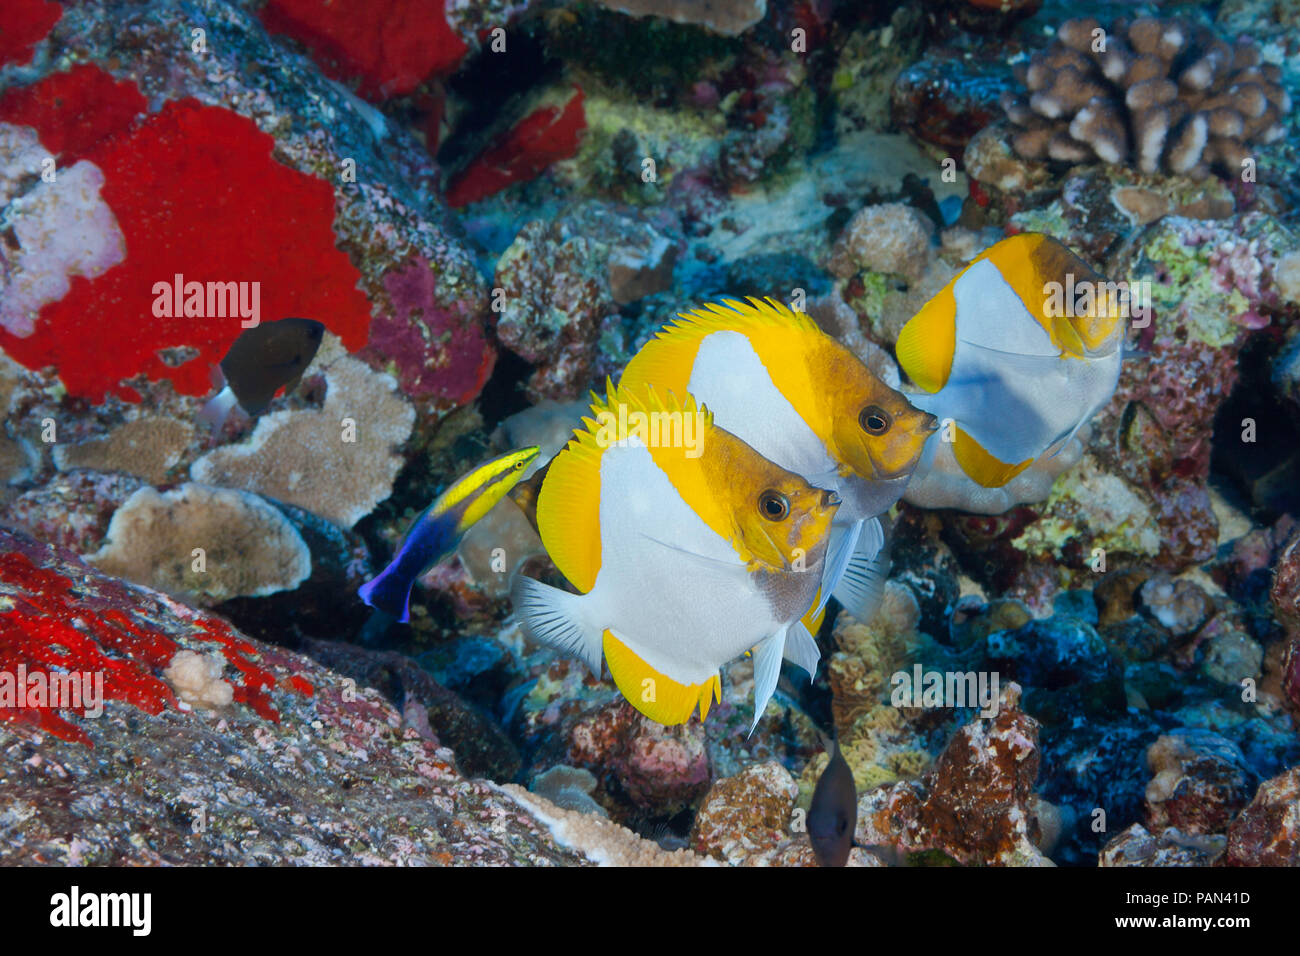 Tres pirámide butterflyfish, Hemitaurichthys polylepis, line up en un limpiador hawaianos endémicos de napoleón, Labroides phthirophagus. Hawaii. Foto de stock